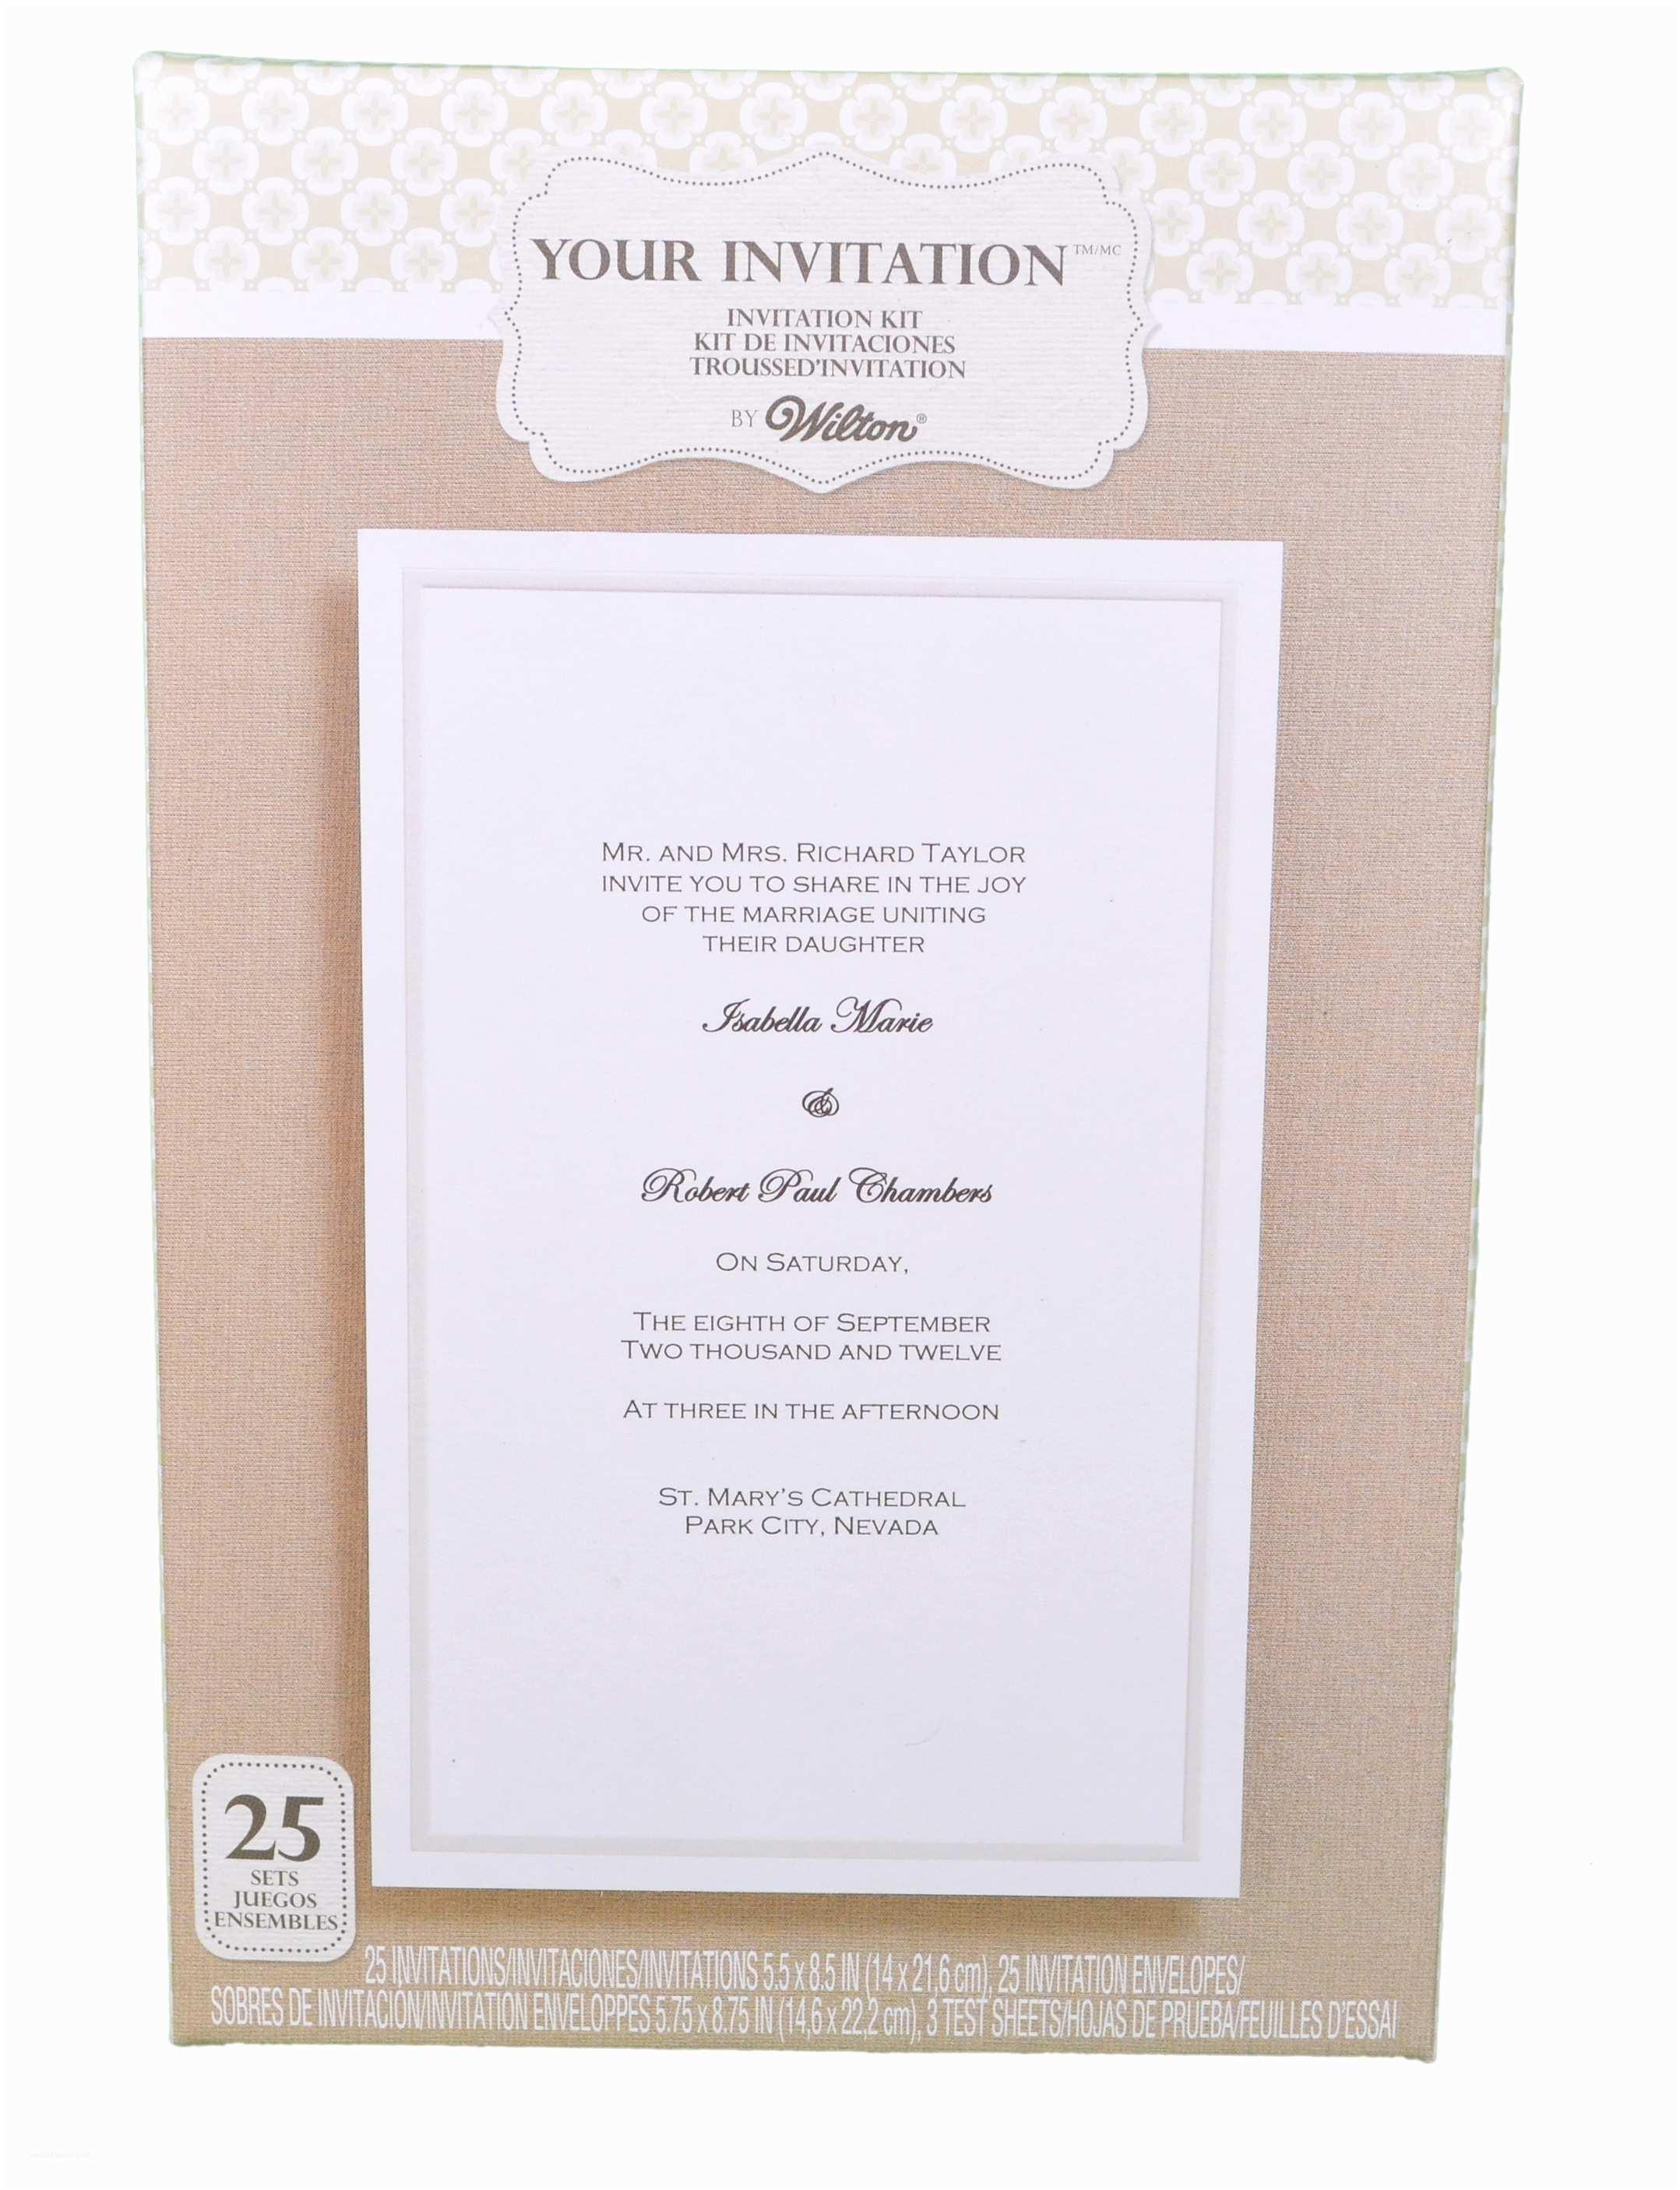 Wilton Wedding Invitation Kits Set Of 25 Wilton Wedding Simplistic White Basic Invitation